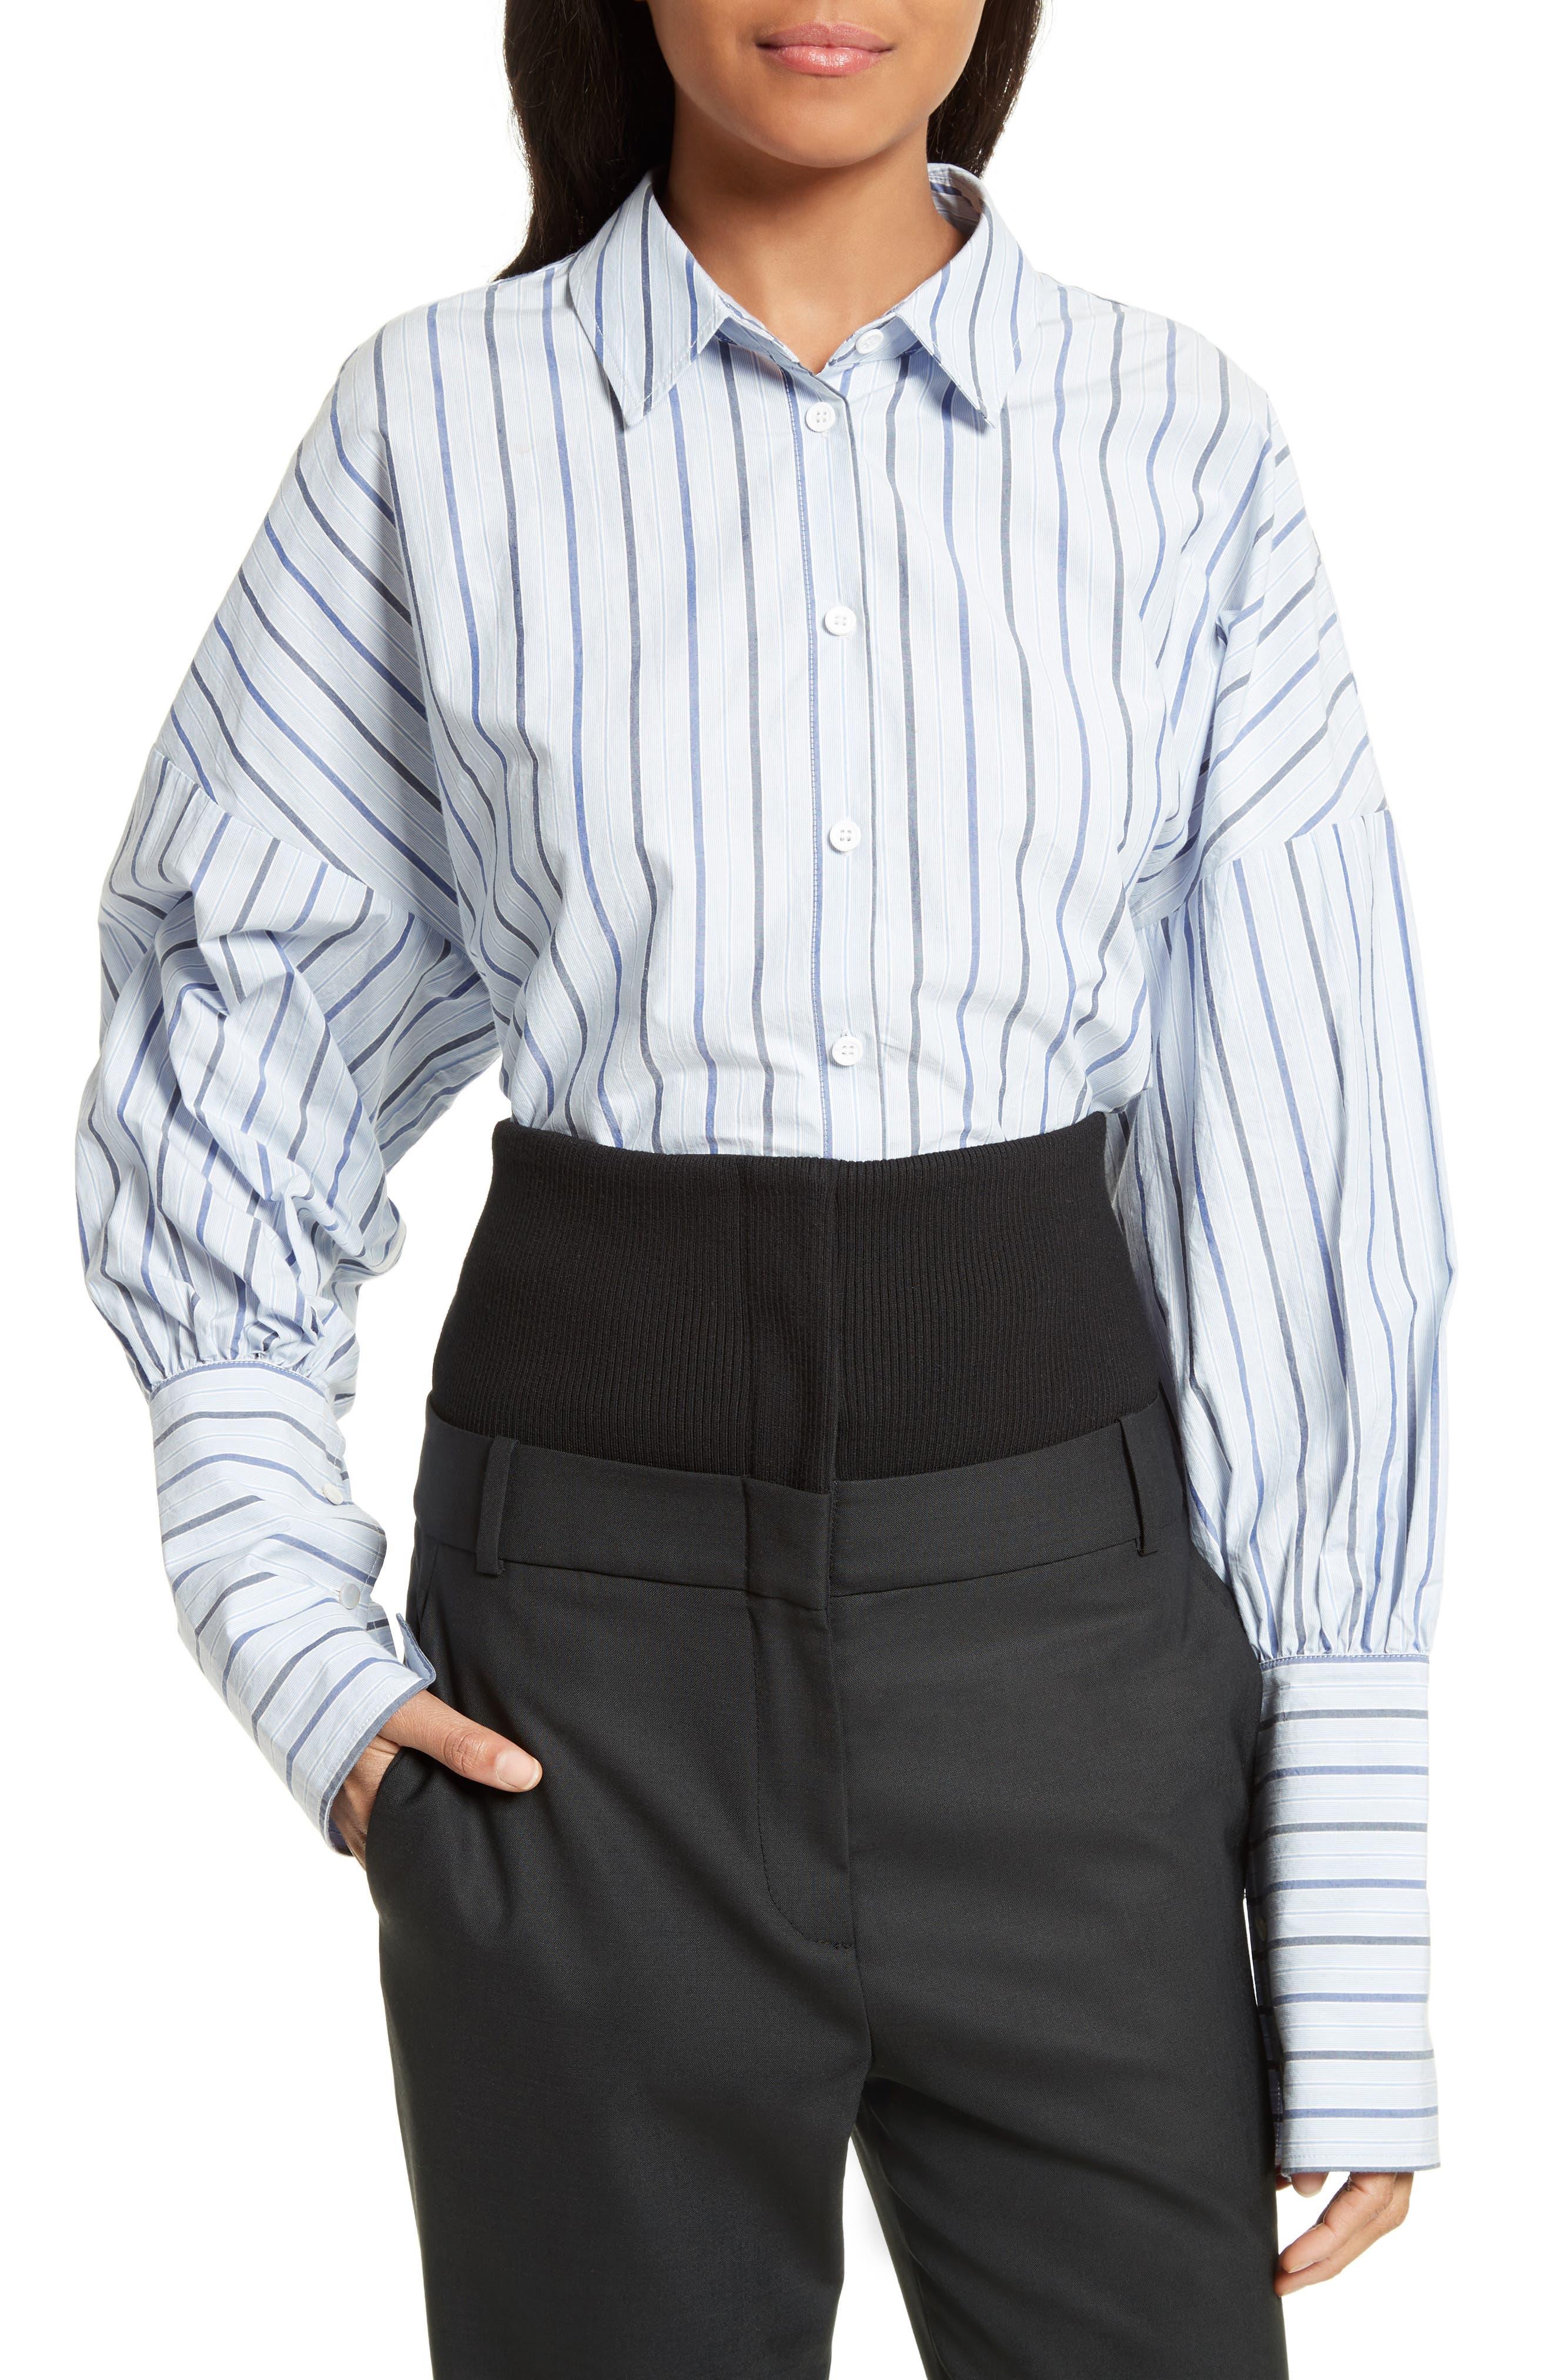 Garçon Stripe Easy Shirt,                             Main thumbnail 1, color,                             402